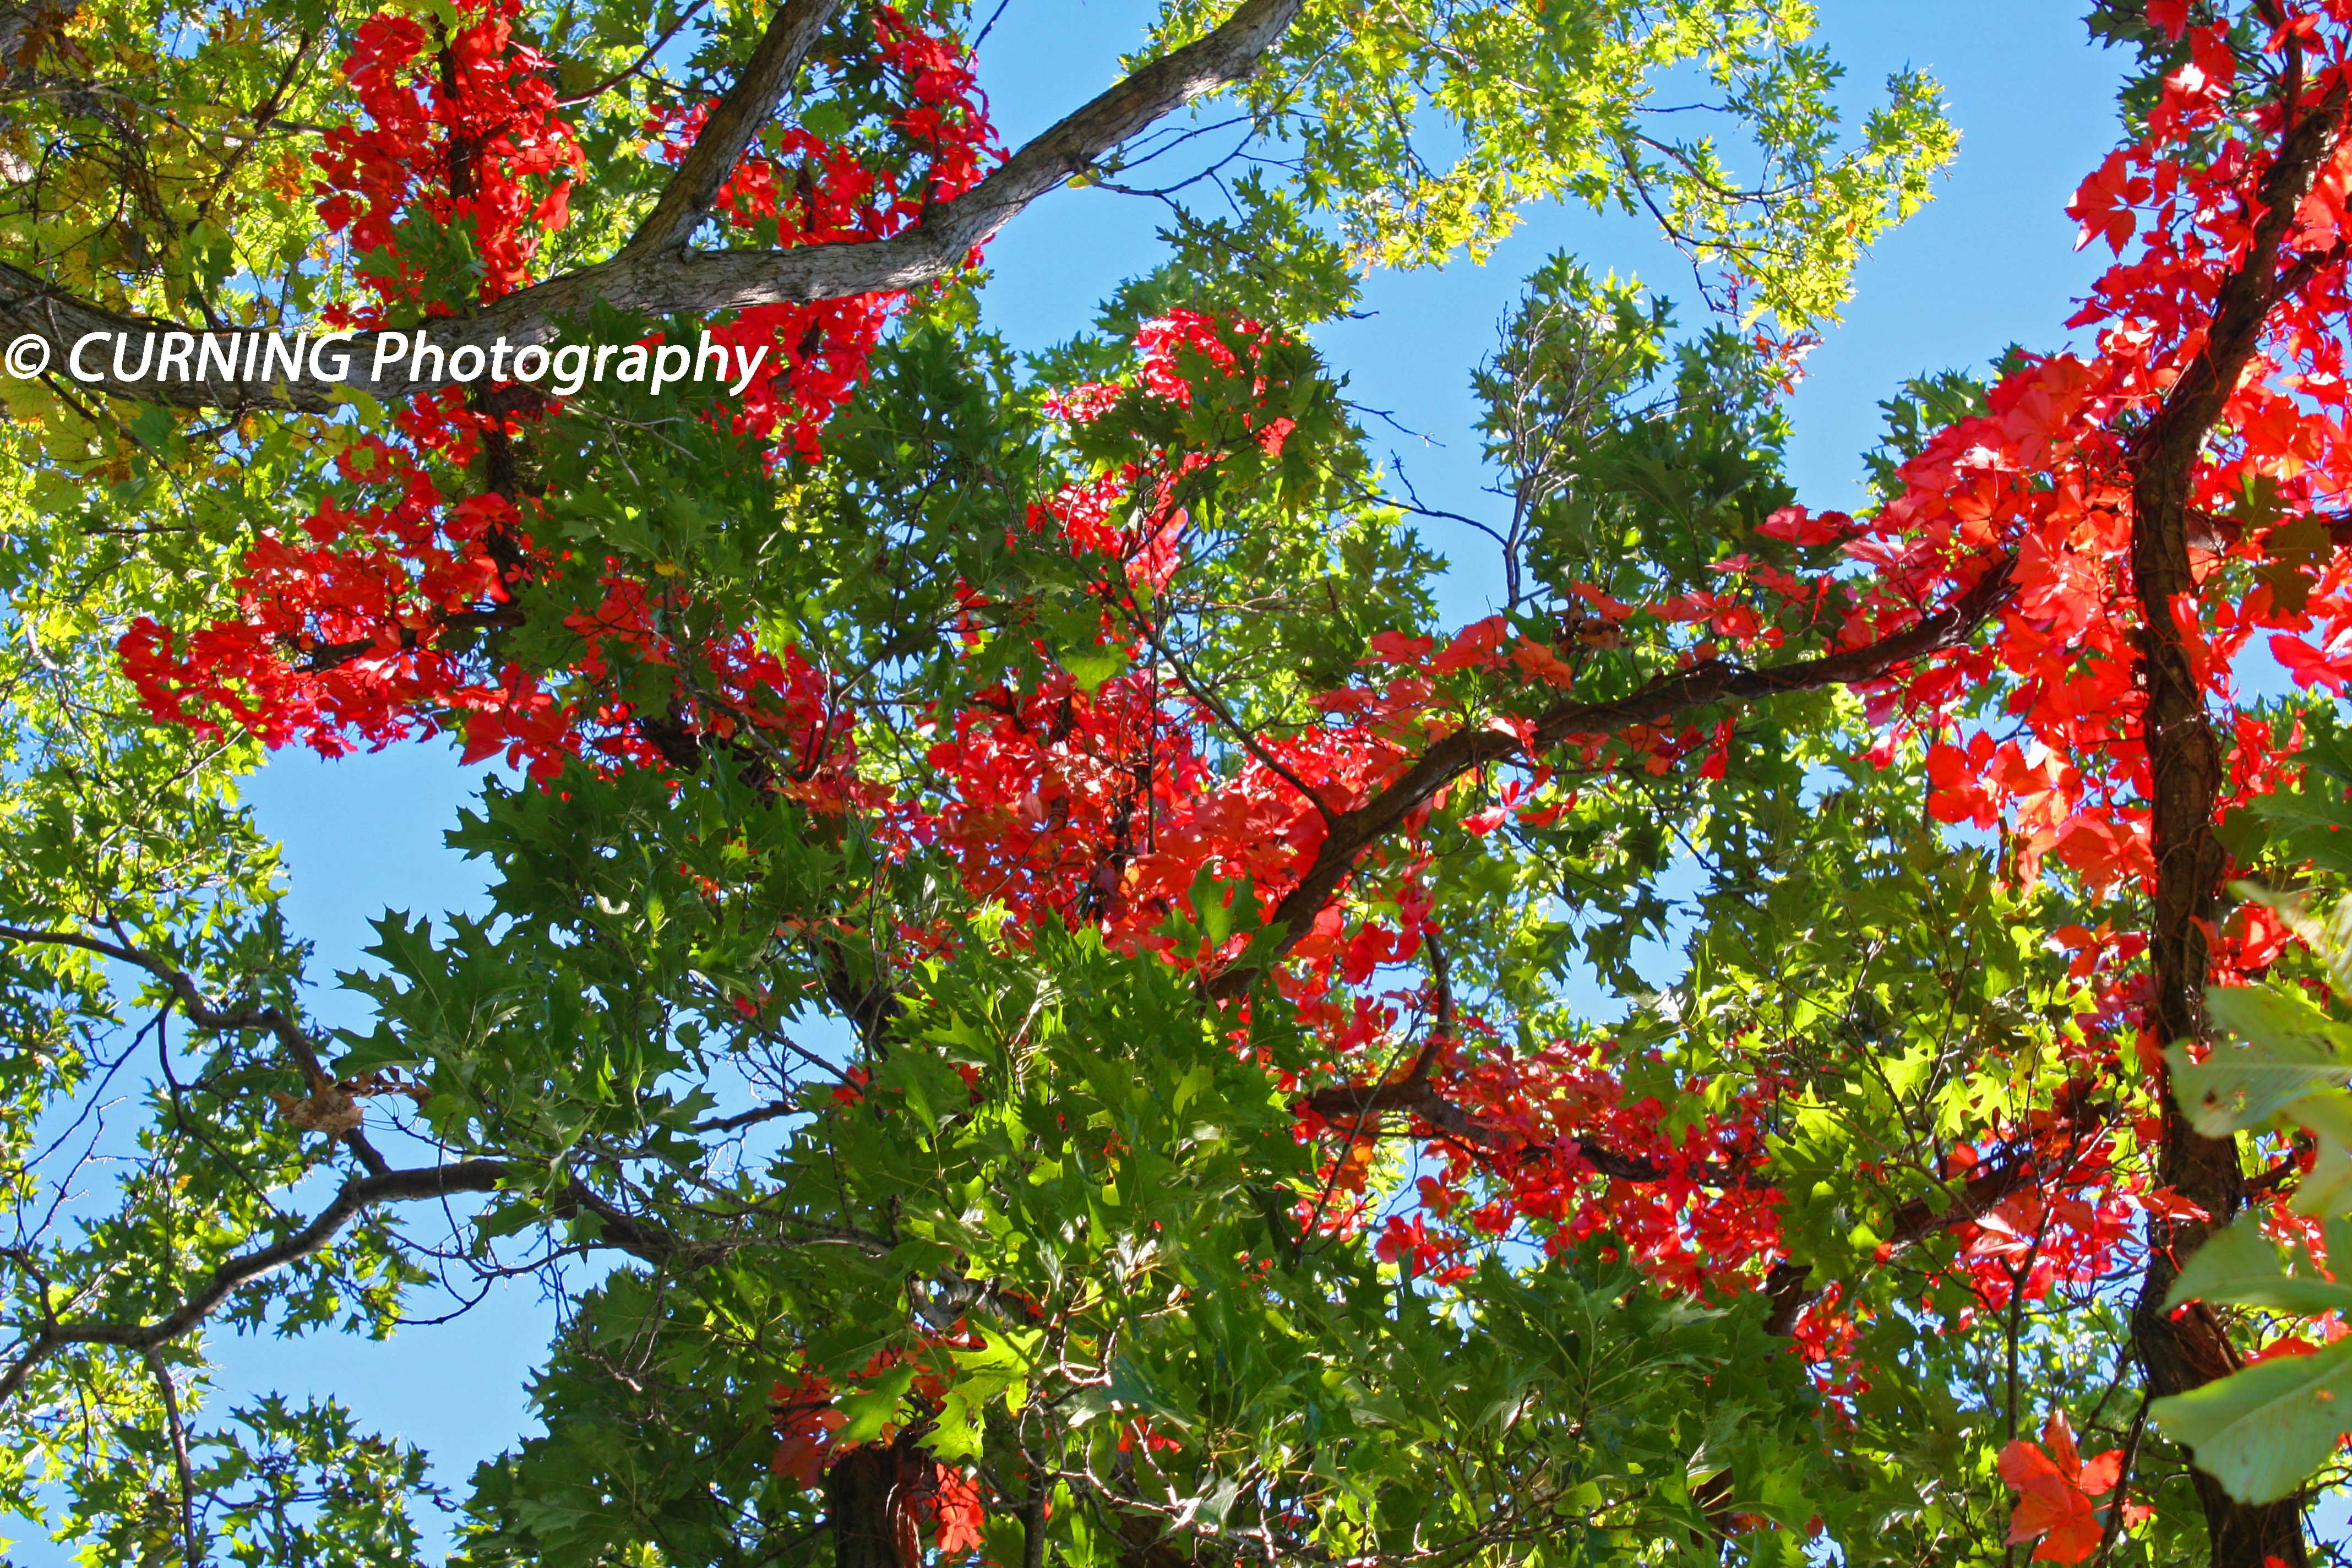 hooray my fav season fall is on it's way!🍂😍 www.CurningPhoto.com . . . . . #Nature_Enjoy #GoOutsideToday #naturelovers #earthfocus #earthofficial #splendidearth #xposuremag #worldshotz #canonusa #canon #canonphotography #photography #art #photograph #wallart #prints #lovetheoutdoors #gooutside #getoutdoors #enjoynature #outdoorexplorer #nature #mothernature #natureseekers #fall #autumn #fallleaves #redleaves #leaves #falltrees